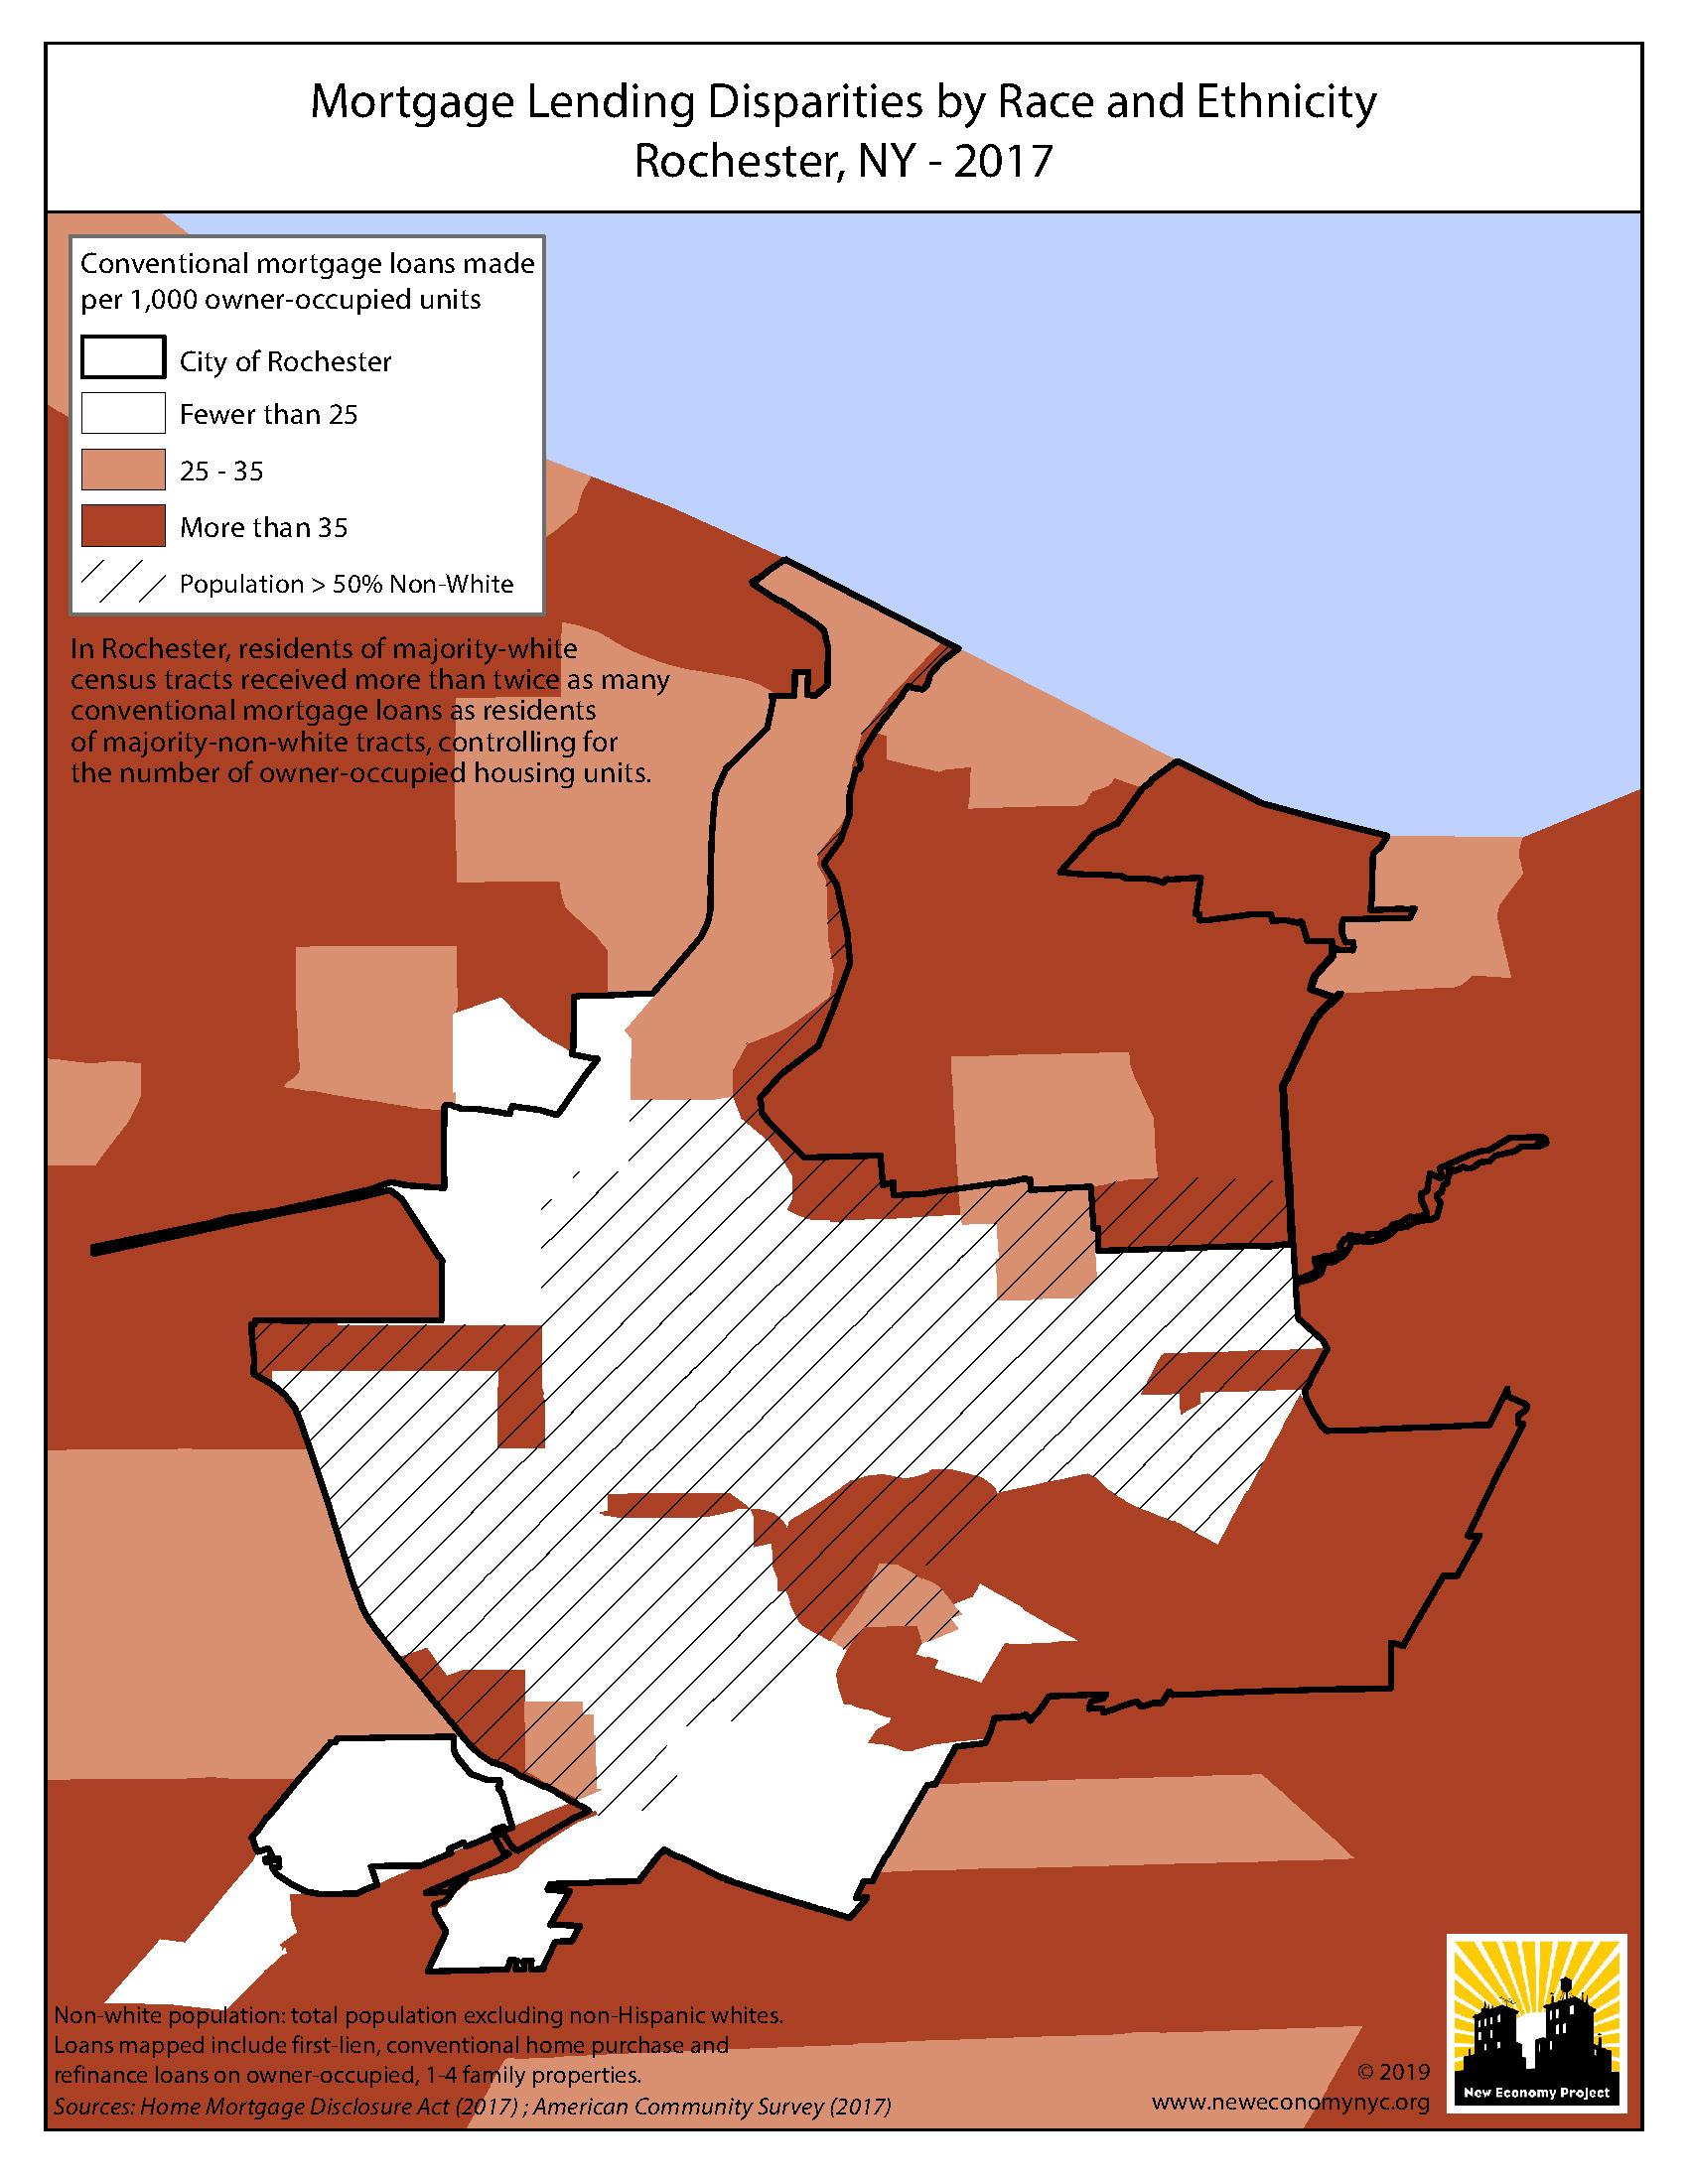 Mortgage Lending Disparities - Rochester